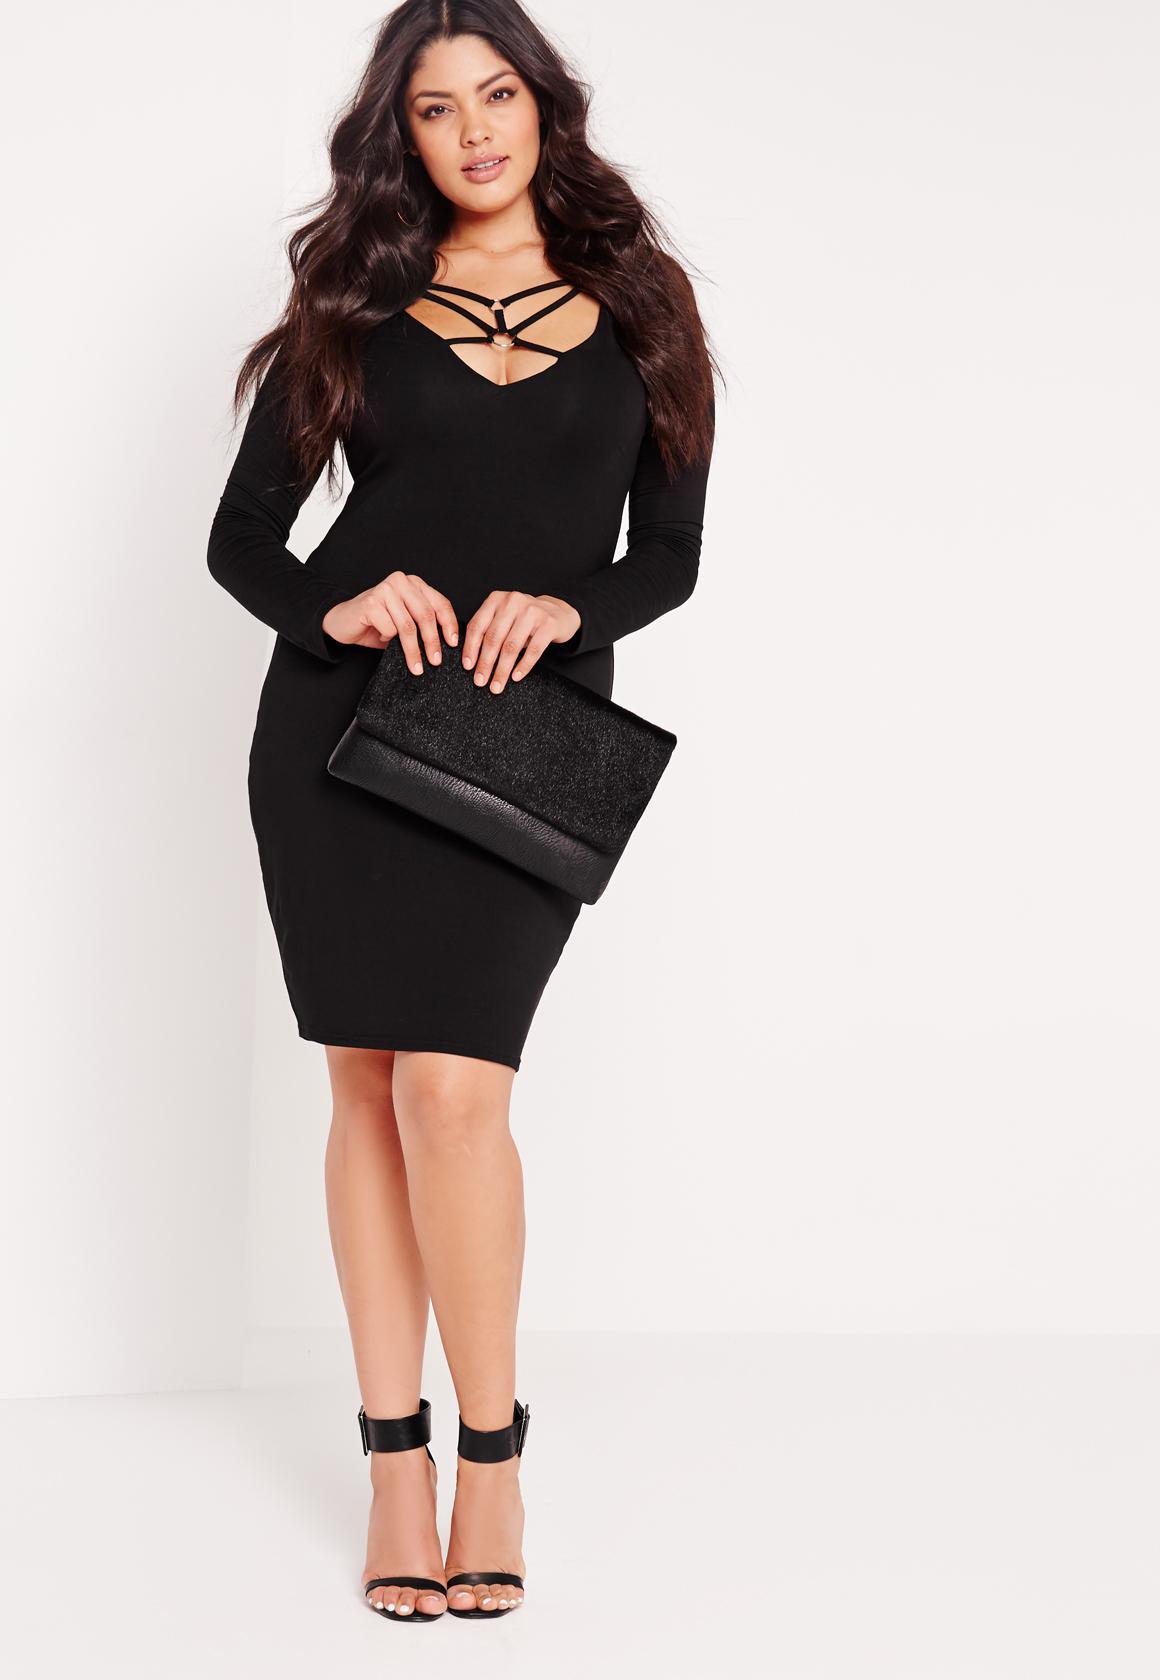 Midi Dresses For Plus Size - Women\'s Dresses